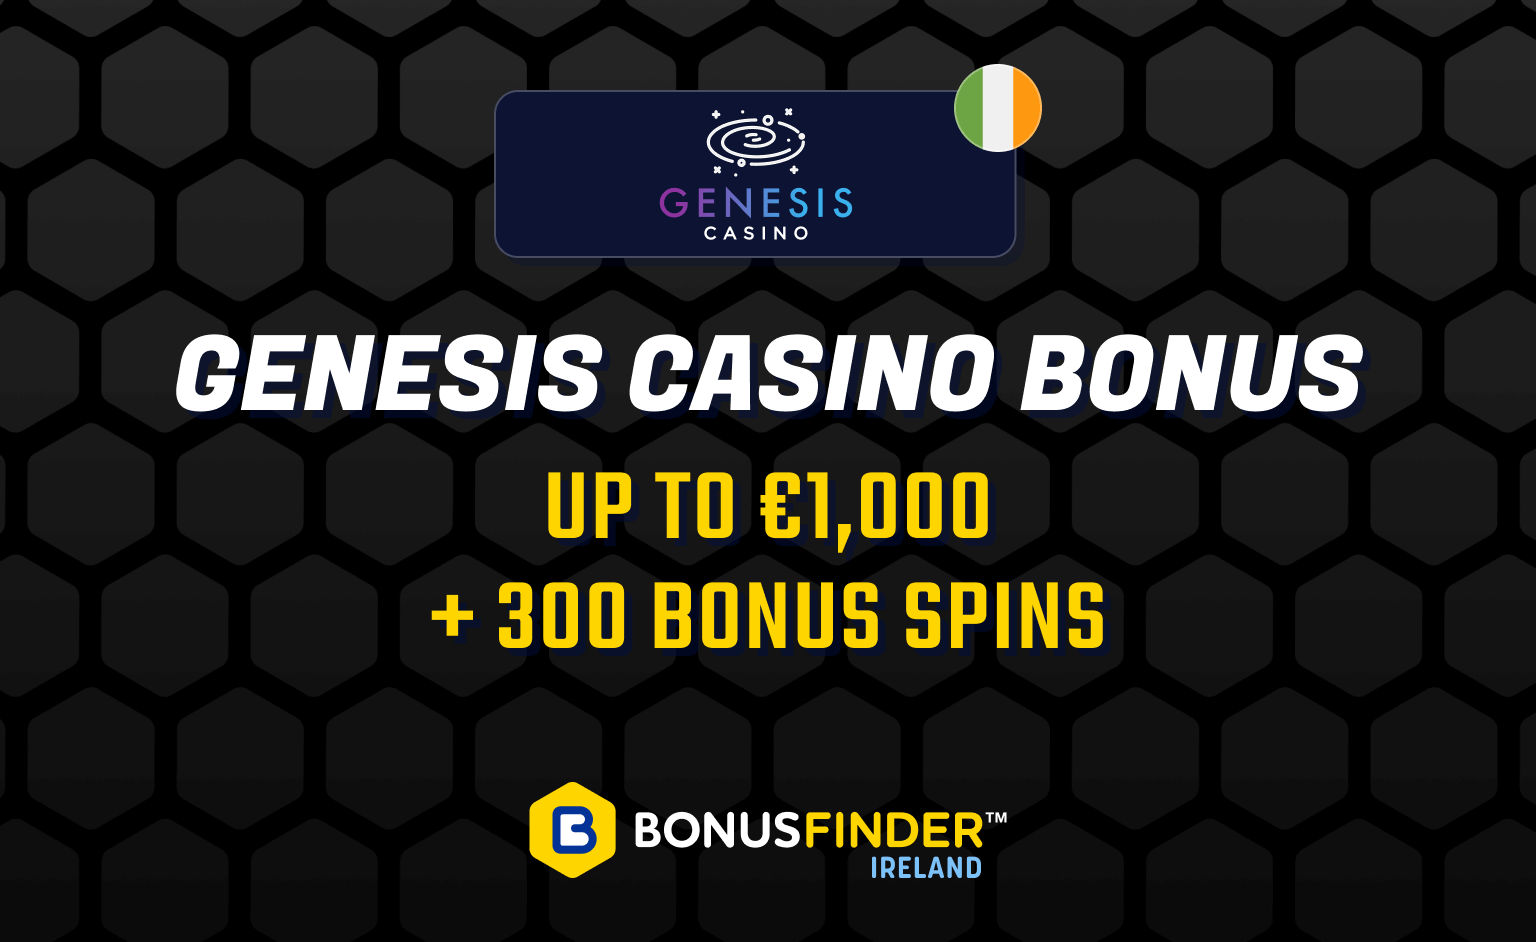 Genesis welcome casino bonus